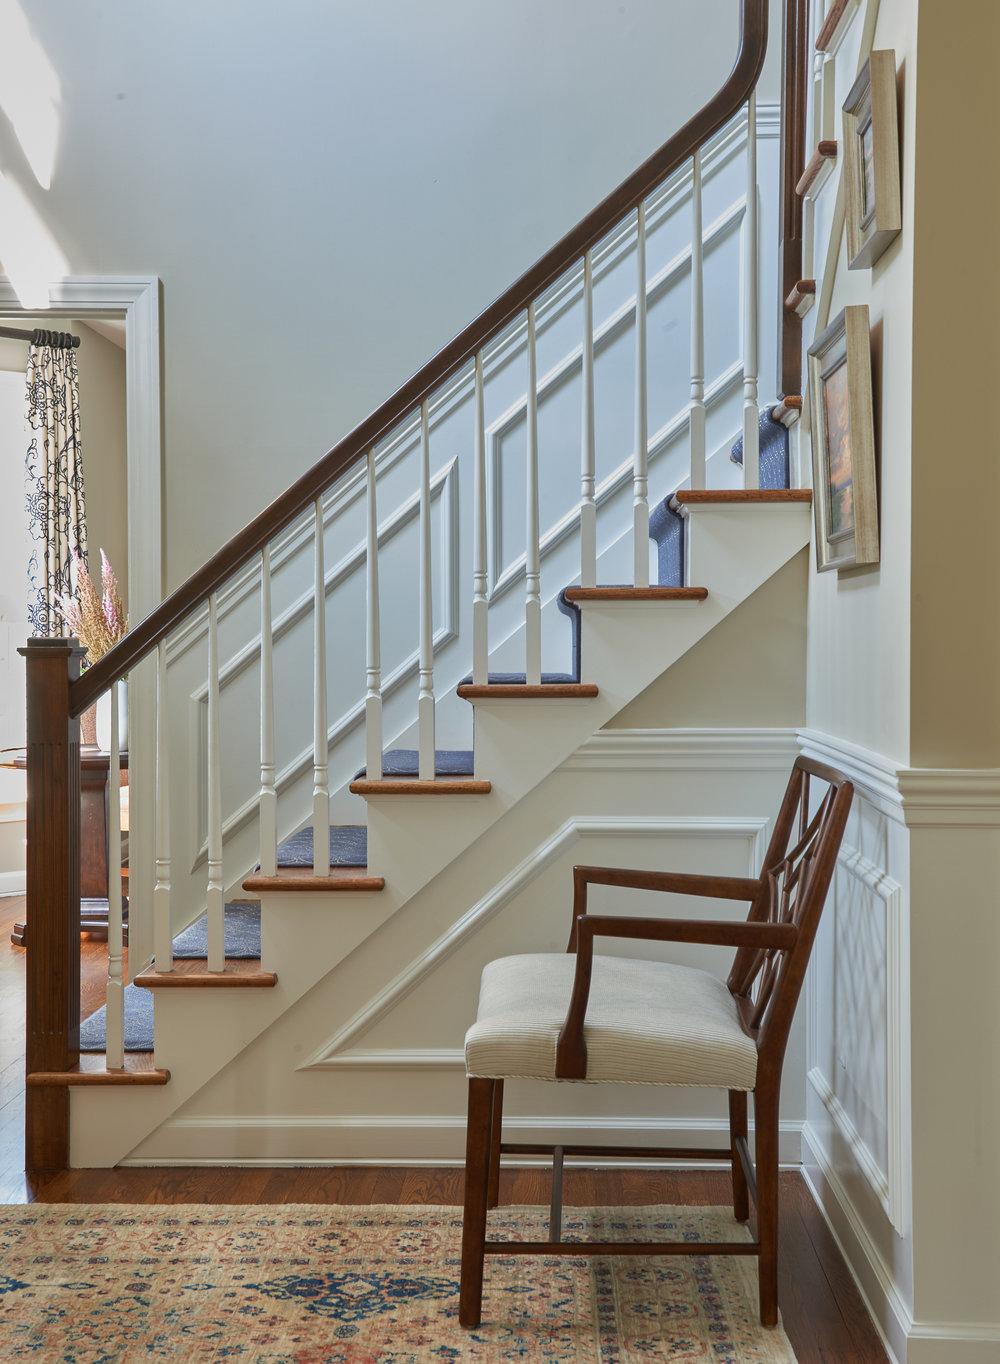 Staircase molding